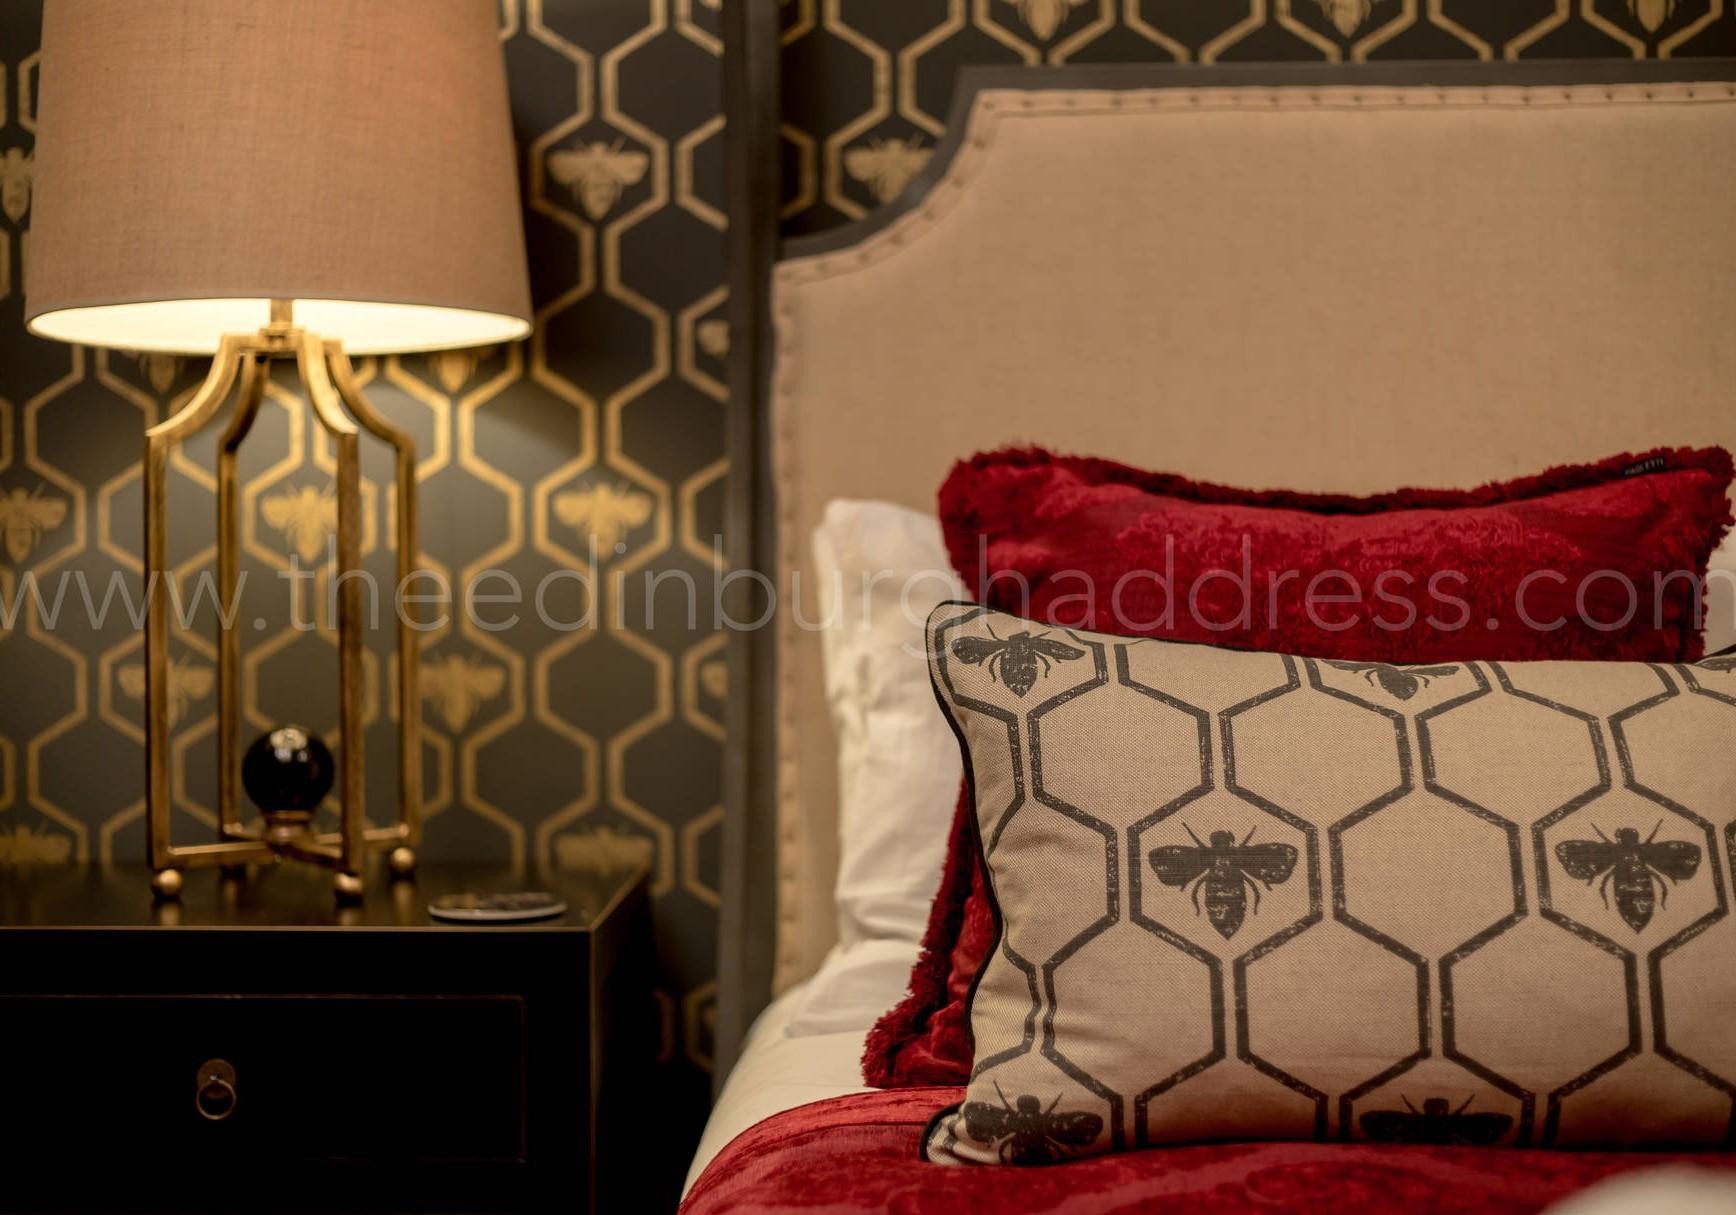 Master Bedroom (© The Edinburgh Address)